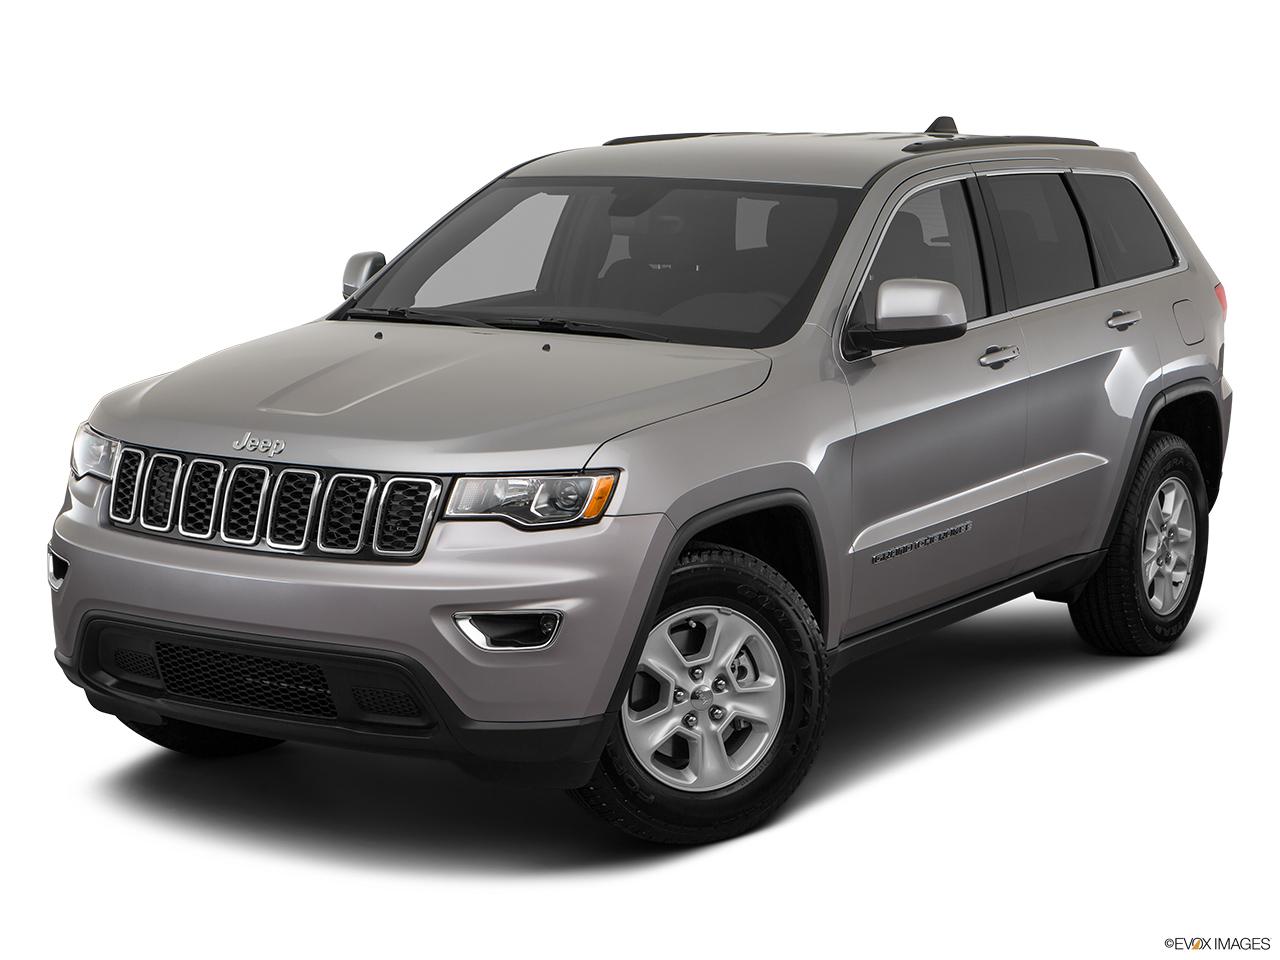 Jeep Grand Cherokee Srt8 Lease Deals Lamoureph Blog